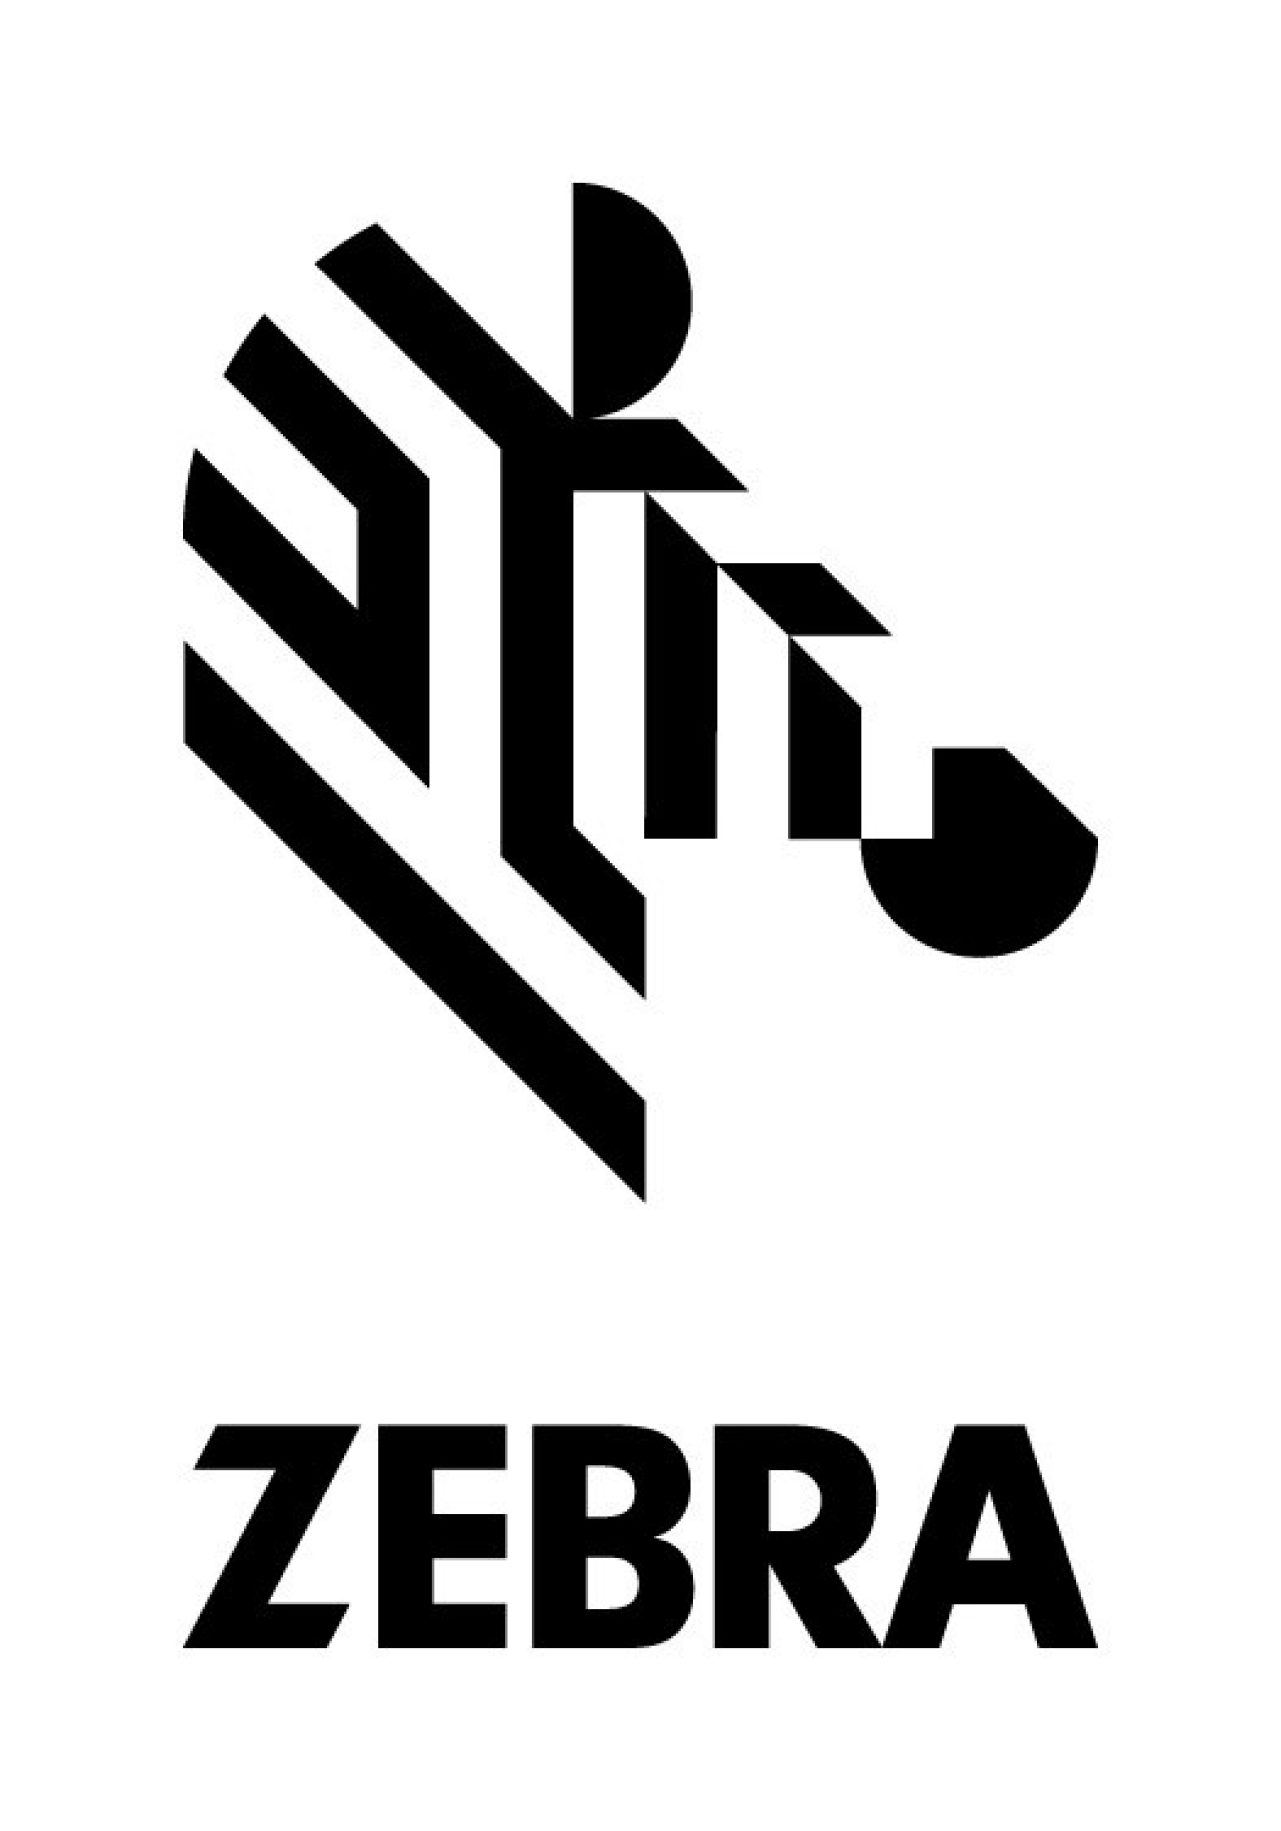 Logotipo de Zebra